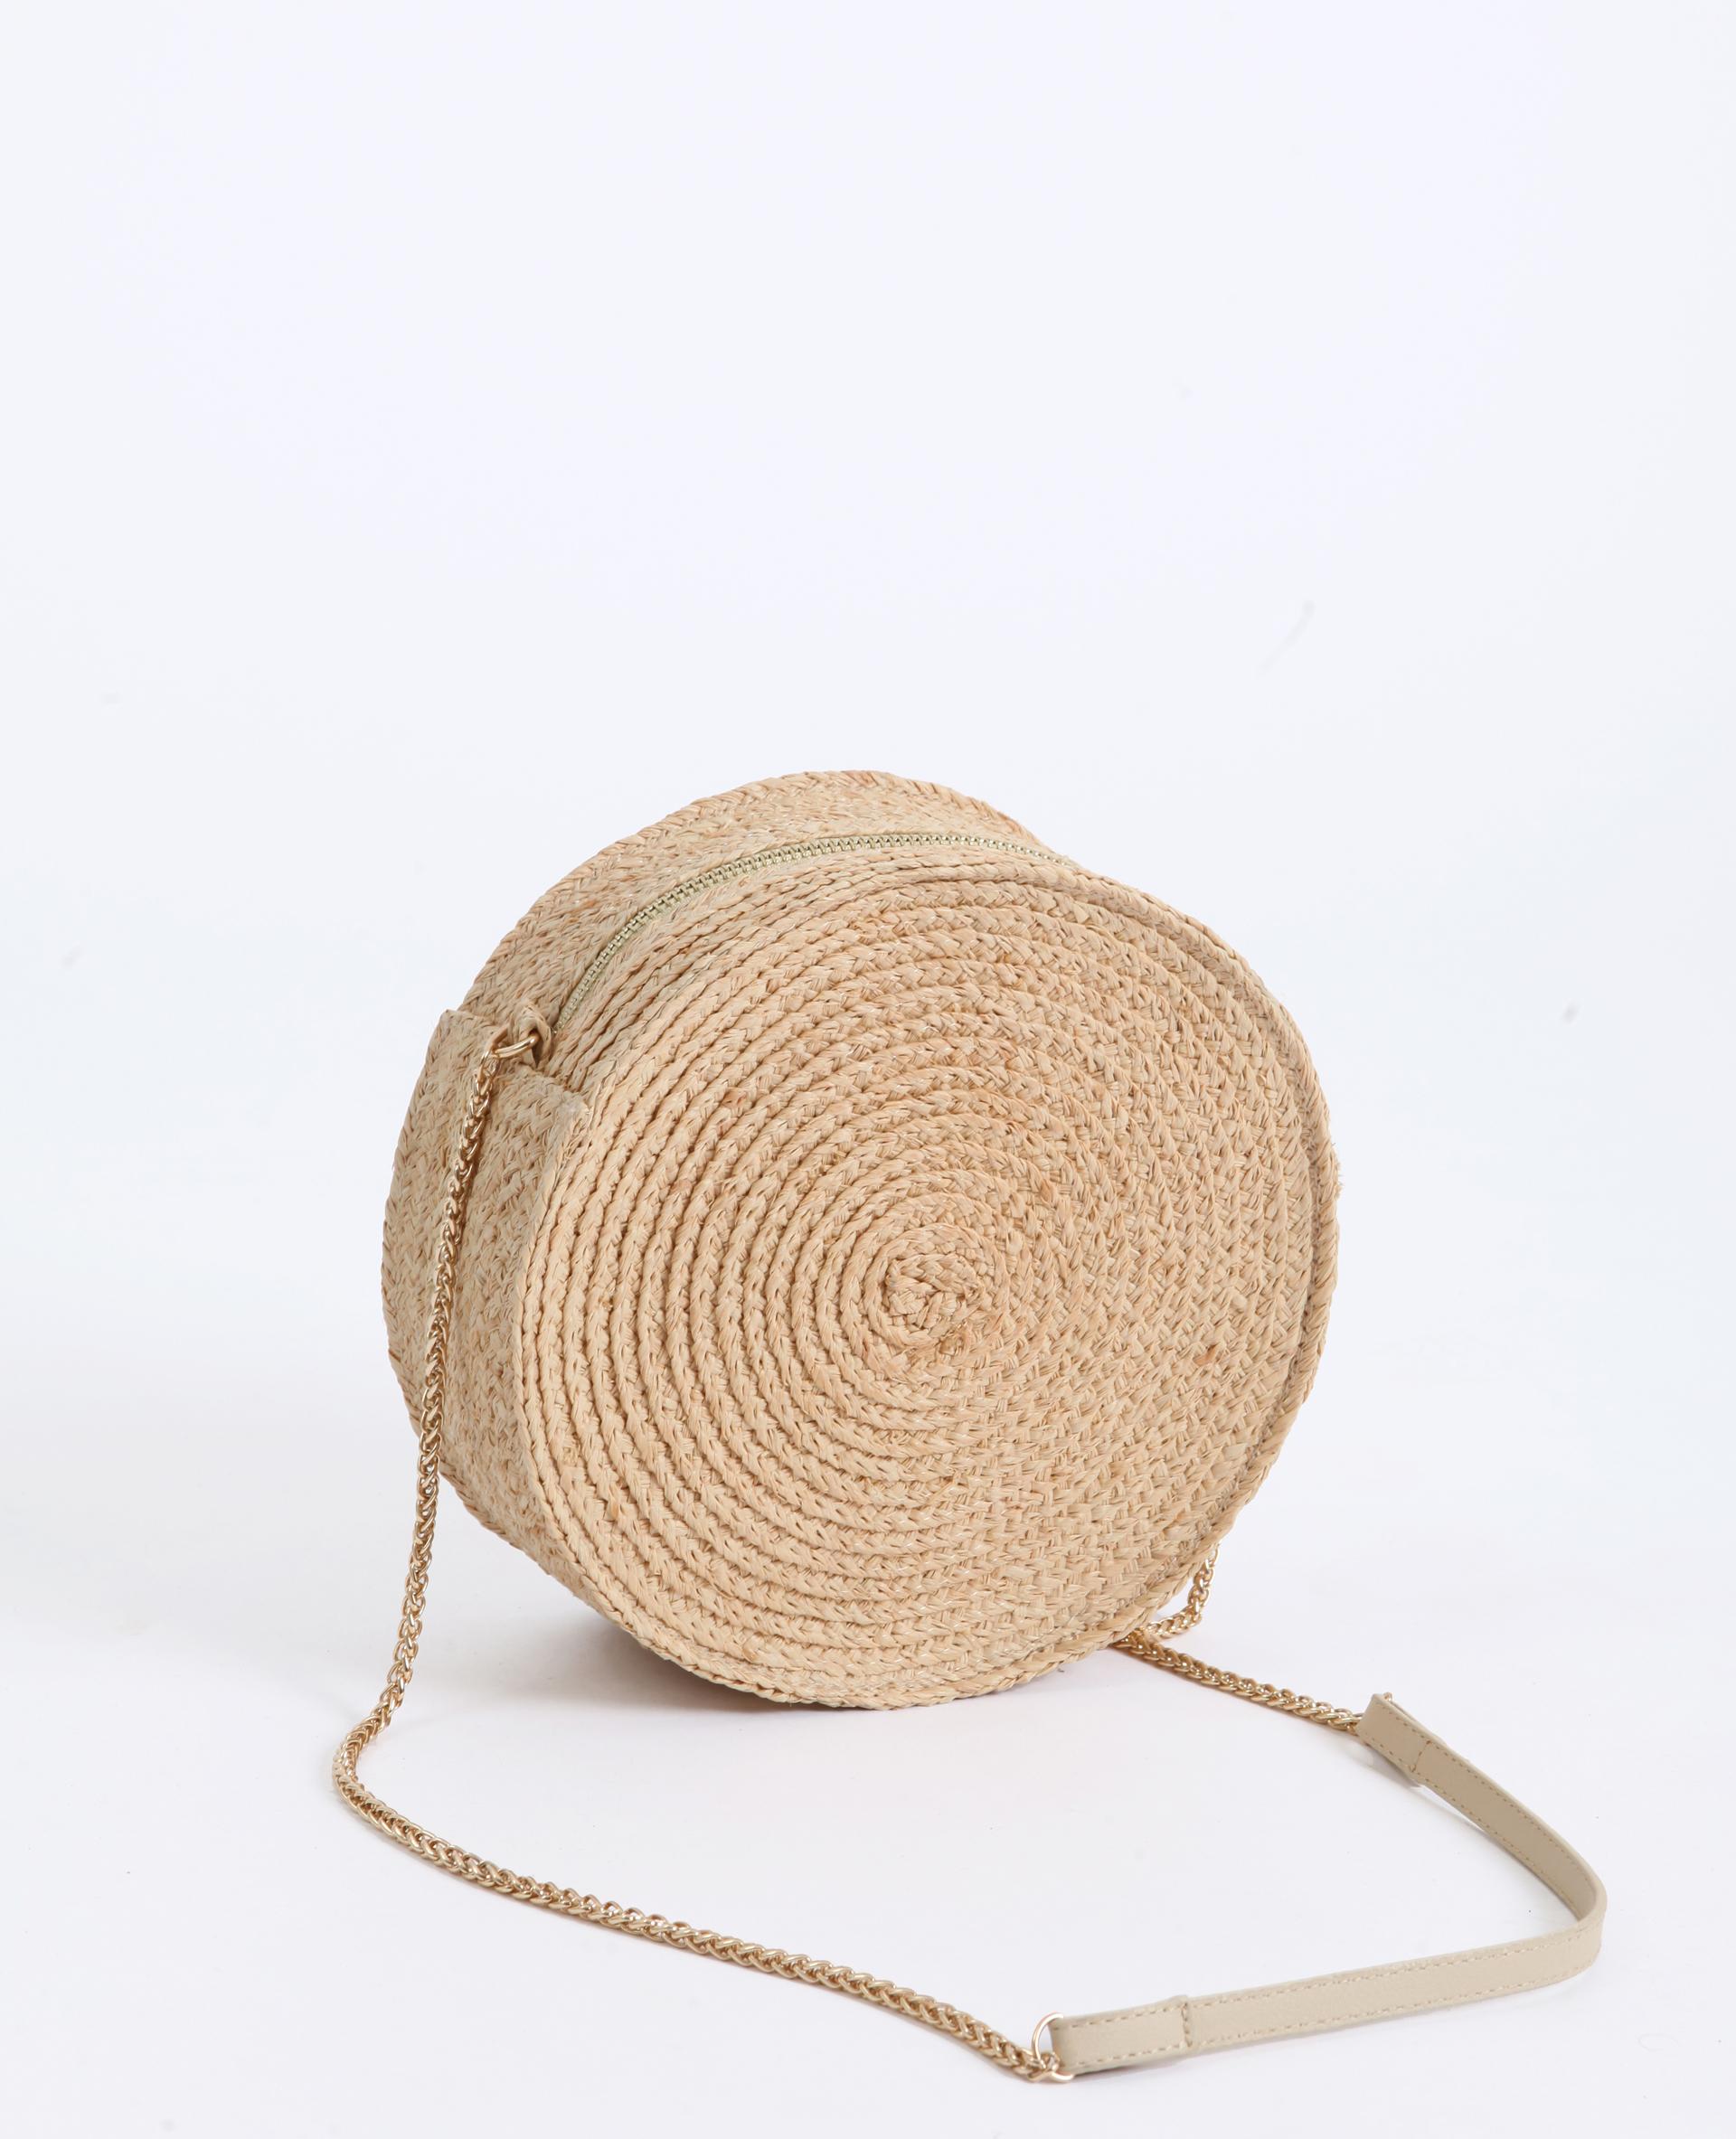 sac rond en paille marron 916957721a01 pimkie. Black Bedroom Furniture Sets. Home Design Ideas